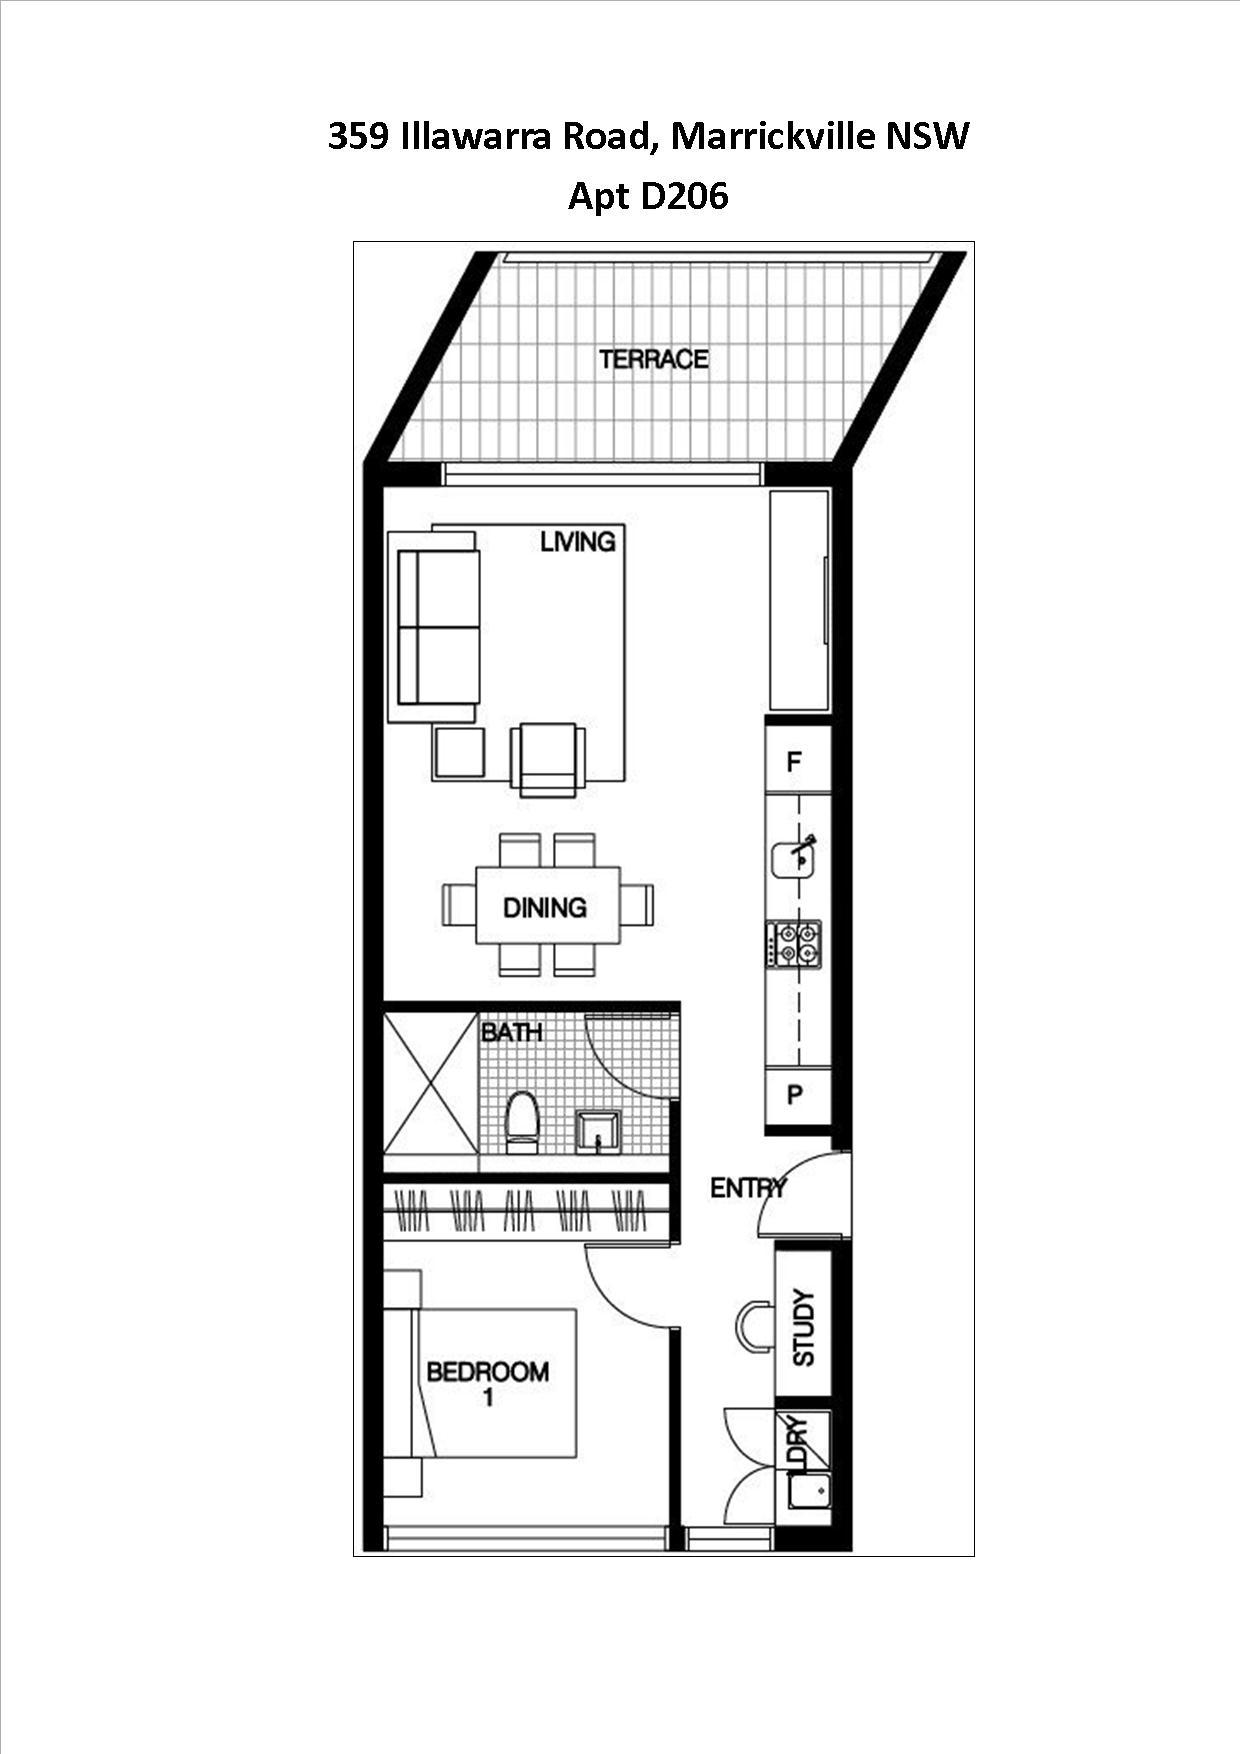 Floor Plan Apt D206 1 x 1 plus study and parking.jpg